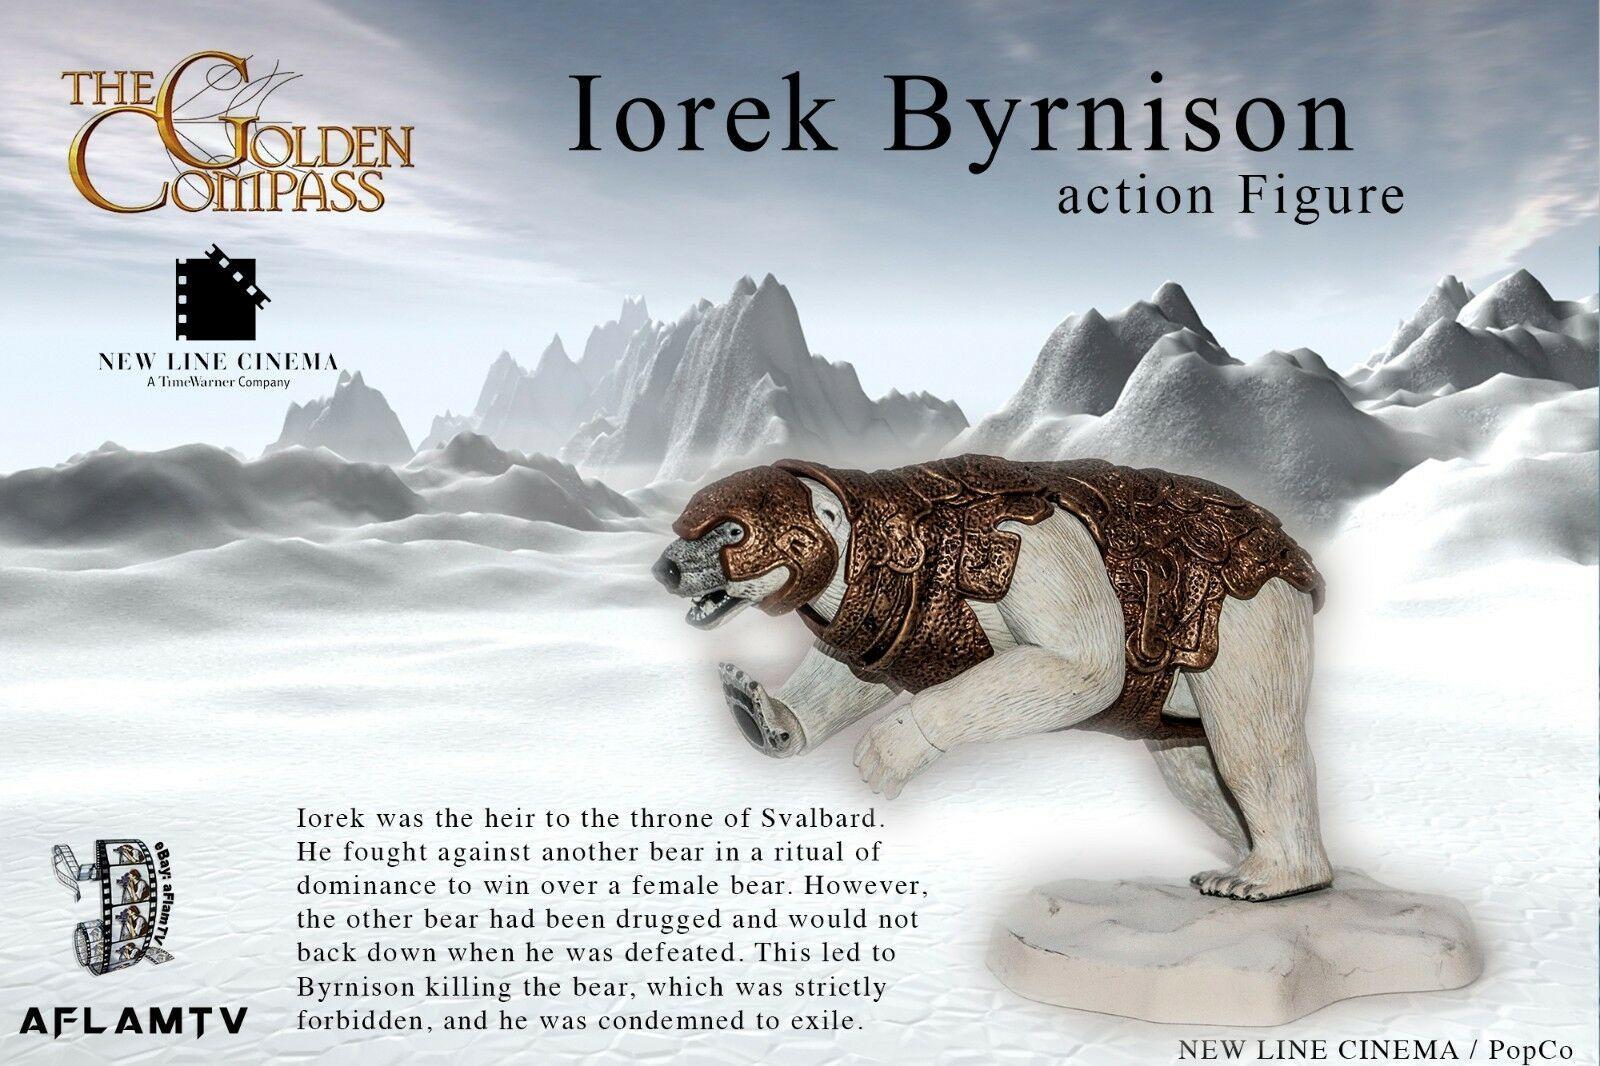 The Golden Compass IOREK BYRNISON Battling Ice Bear ACTION FIGURE NUOVA